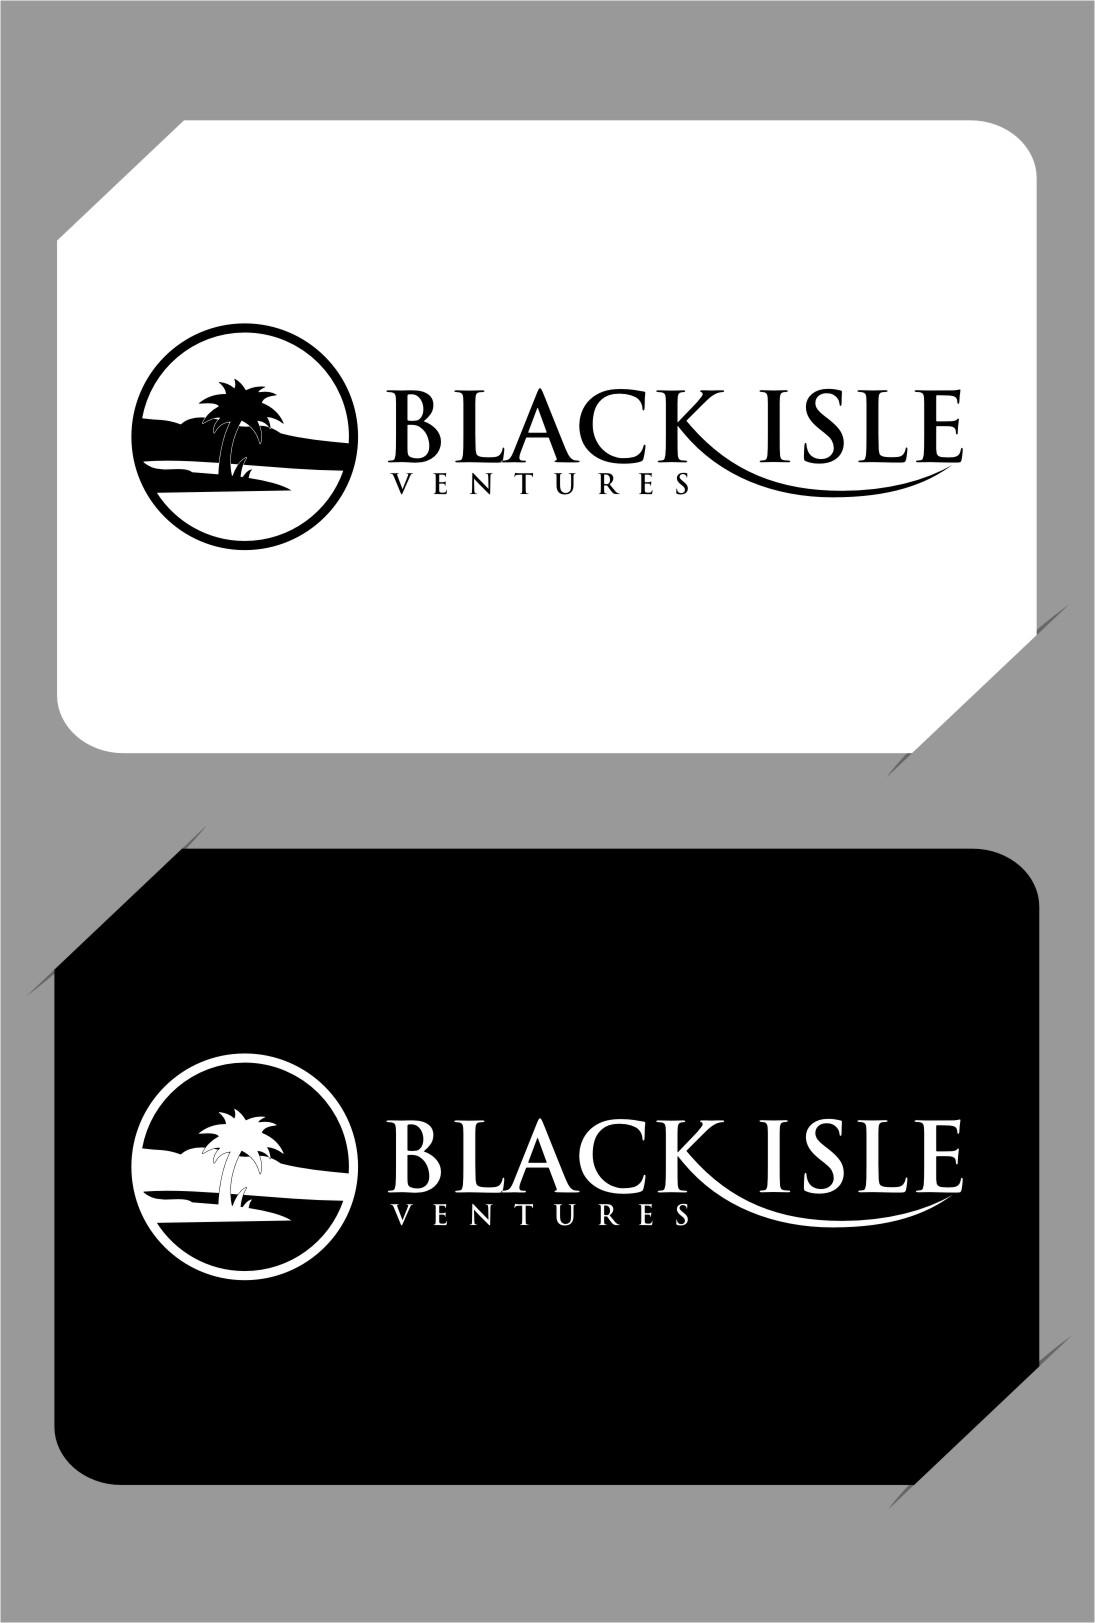 Logo Design by Ngepet_art - Entry No. 114 in the Logo Design Contest Creative Logo Design for Black Isle Ventures.